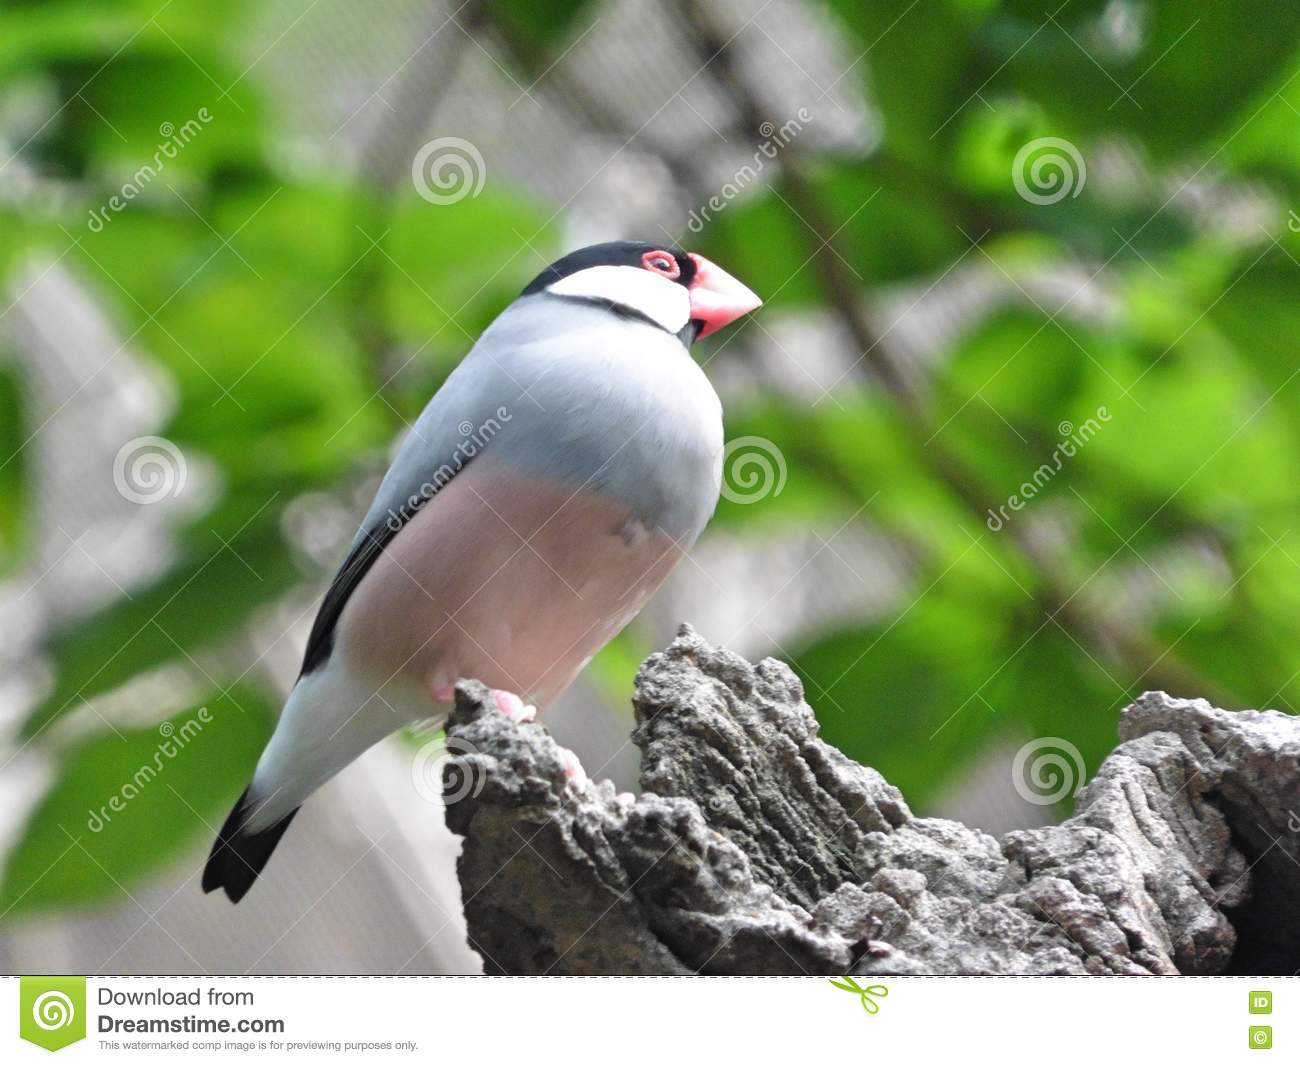 The Java Sparrow Bird Royalty Free Stock Image.